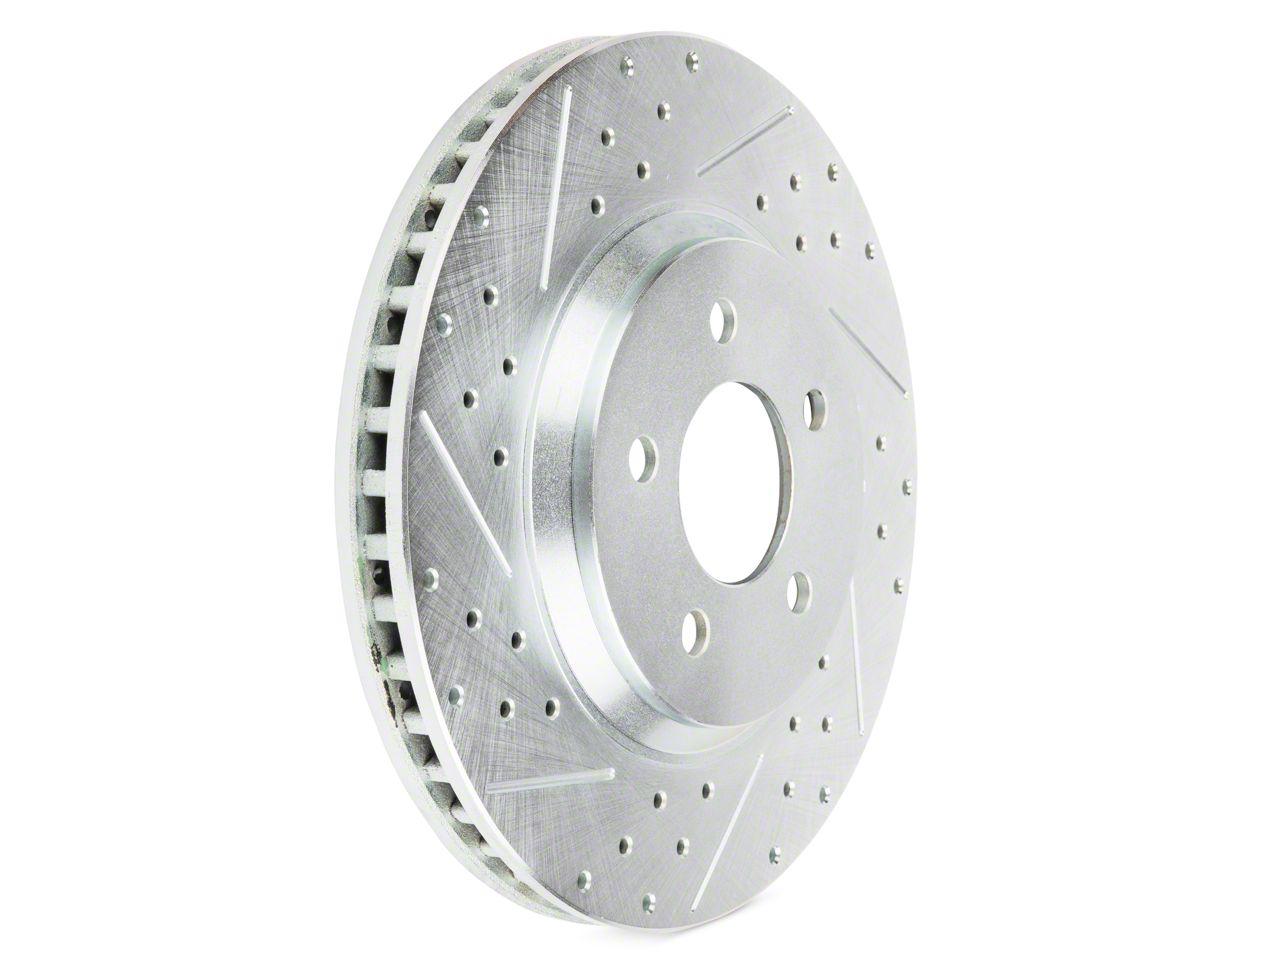 Baer Sport Rotors - Front Pair (05-10 GT; 11-17 V6)